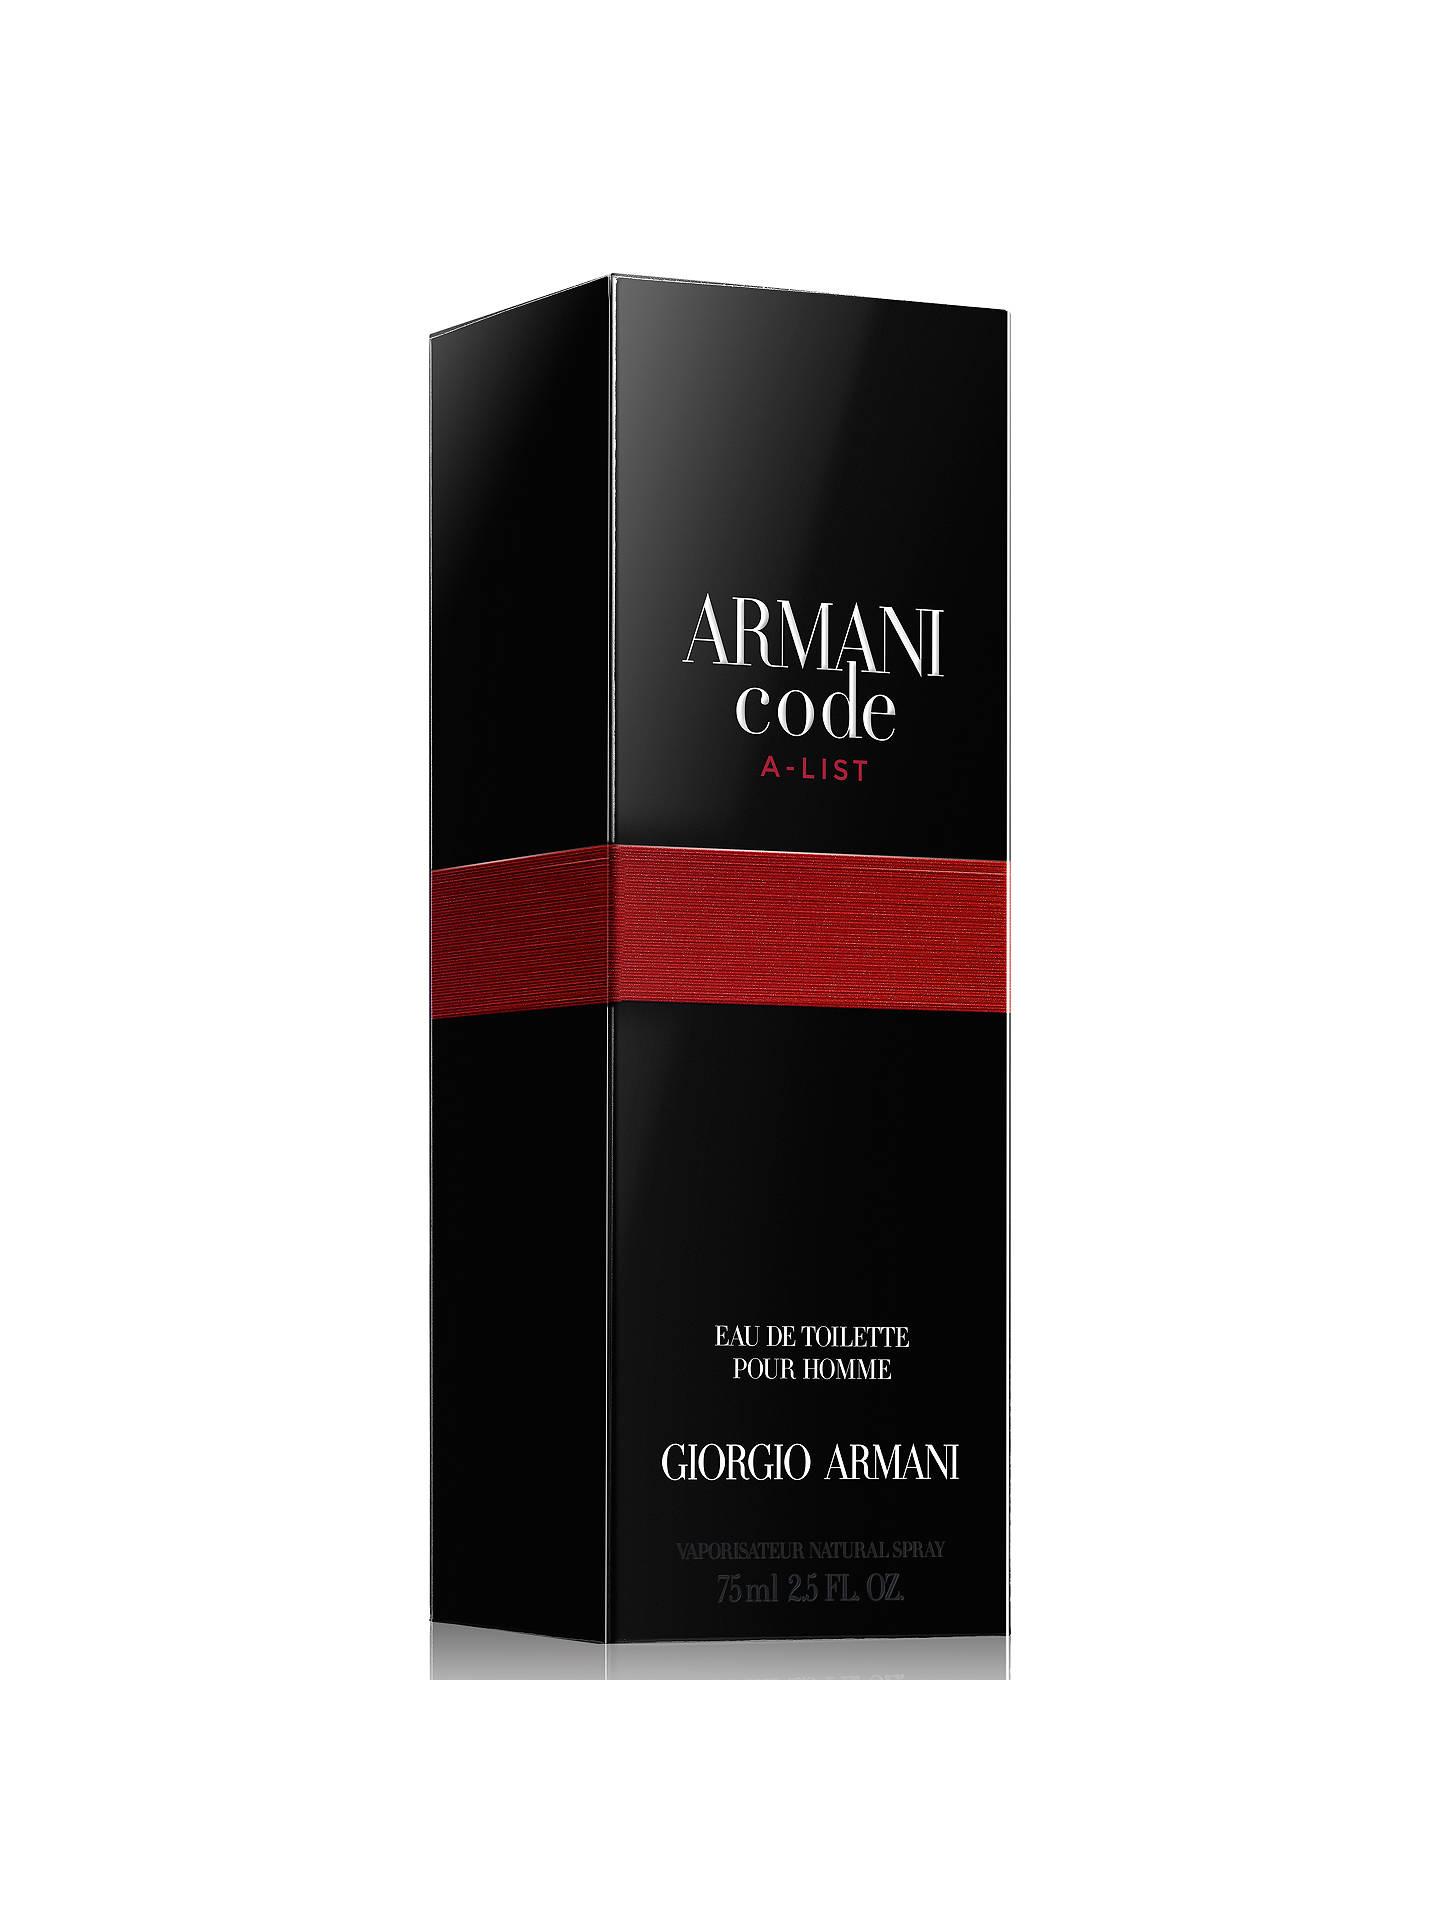 9a733b77136 ... BuyGiorgio Armani Code A-List For Men Limited Edition Eau de Toilette